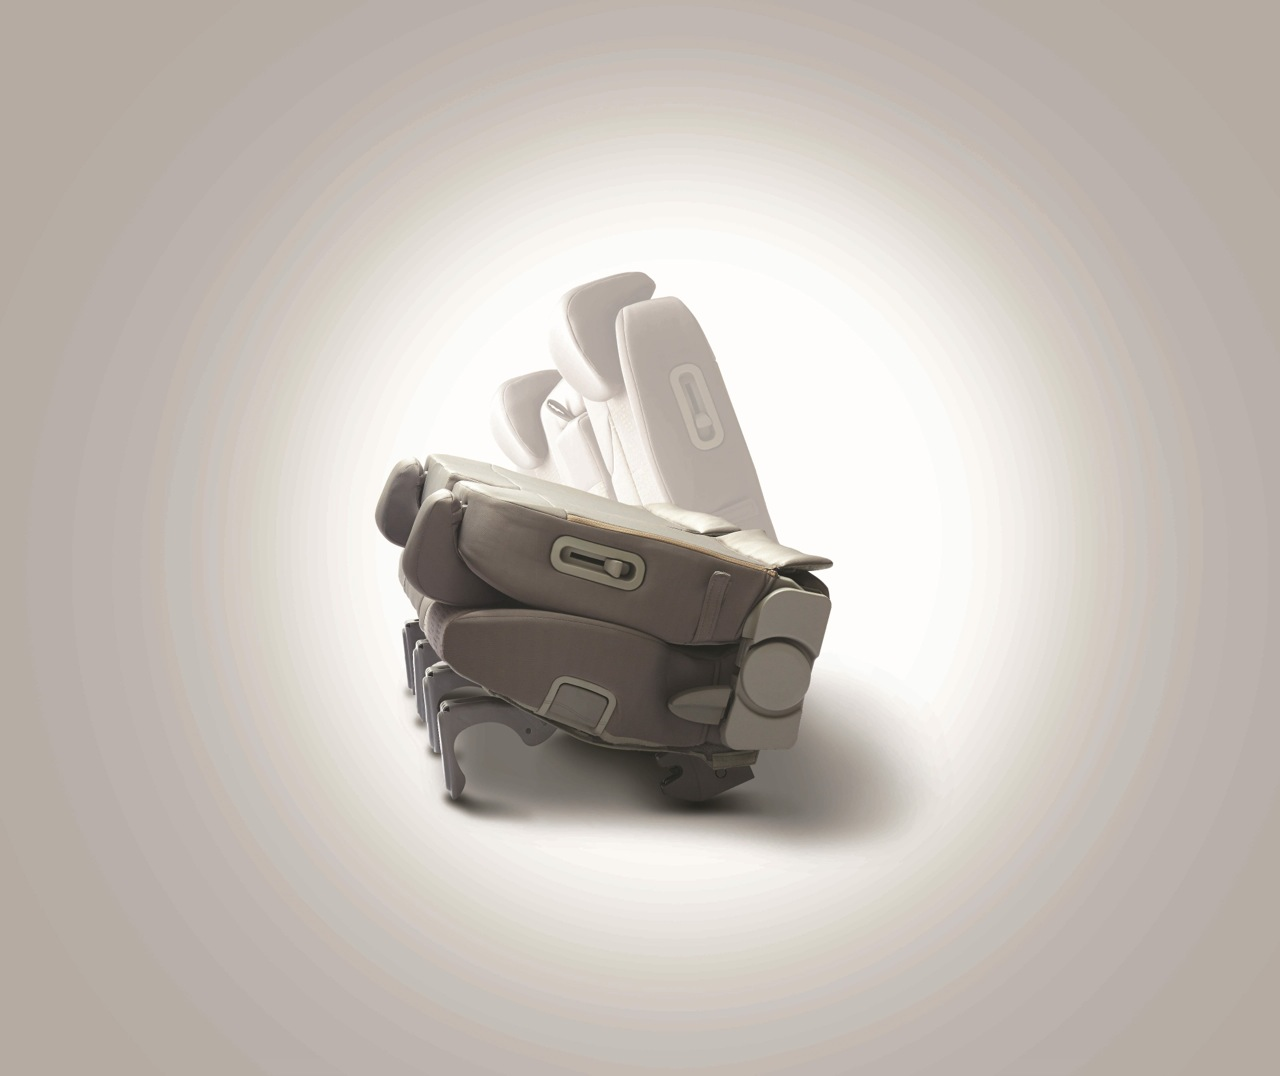 Mahindra-Quanto-Folding-Yoga-Seats (1)